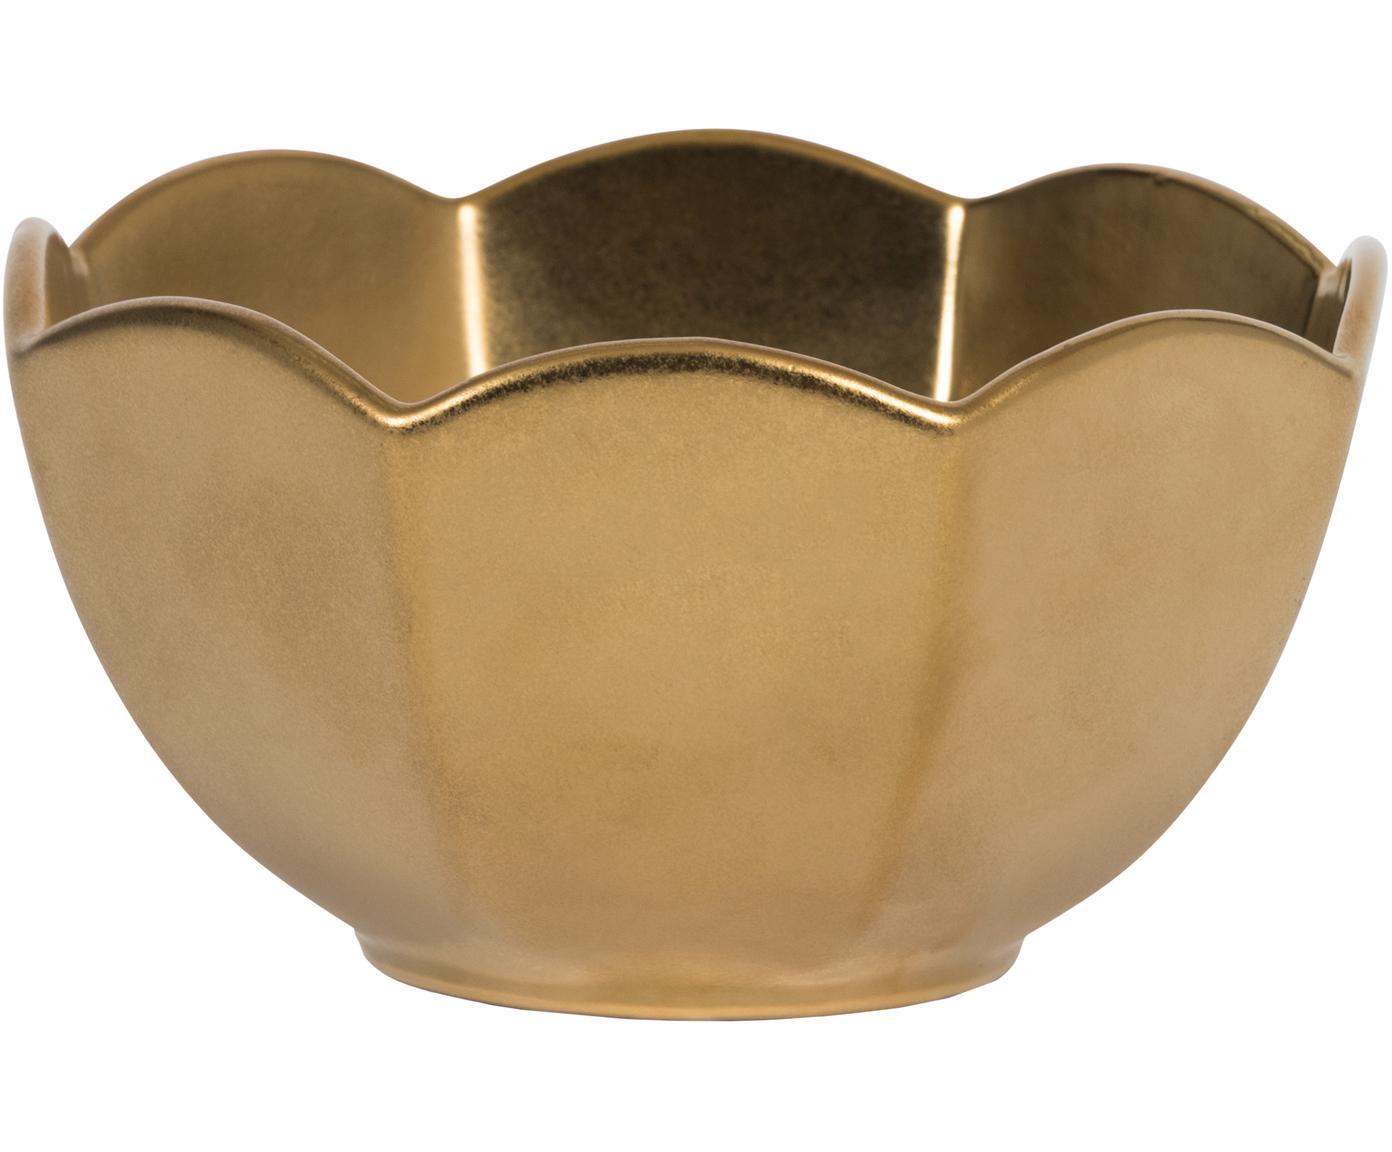 Schaal Ghabi in mat goudkleur, Keramiek, Goudkleurig, Ø 13 cm